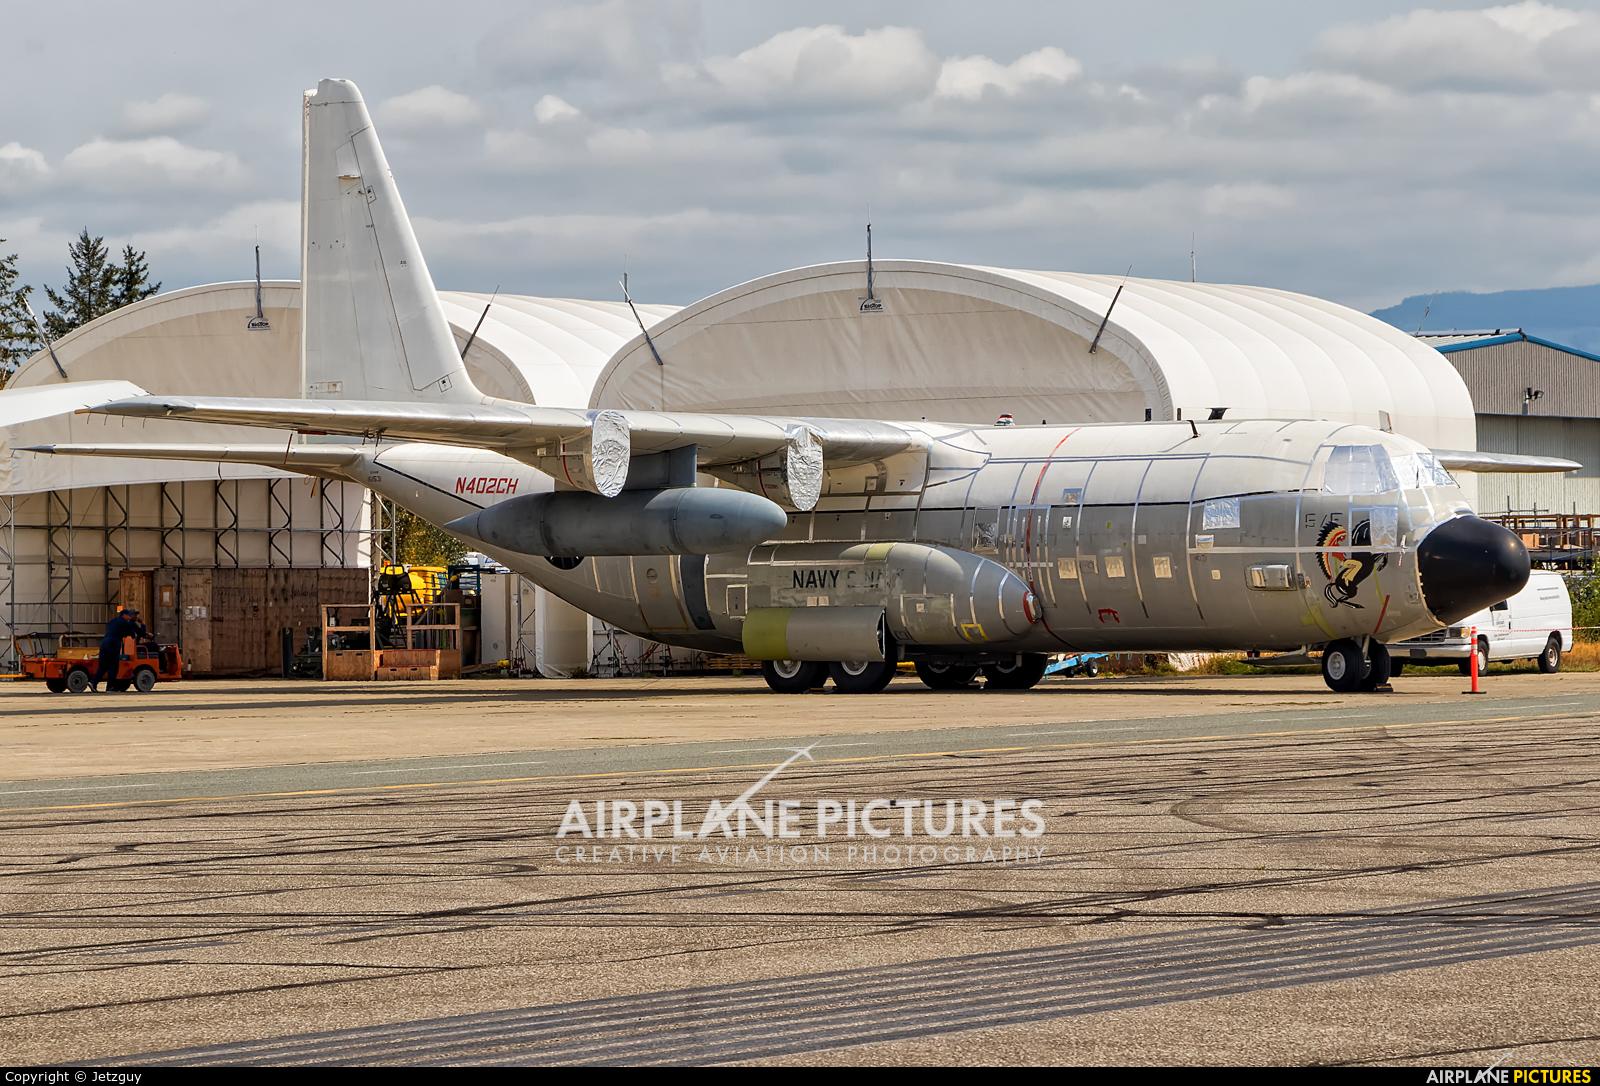 Private N402CH aircraft at Abbotsford, BC